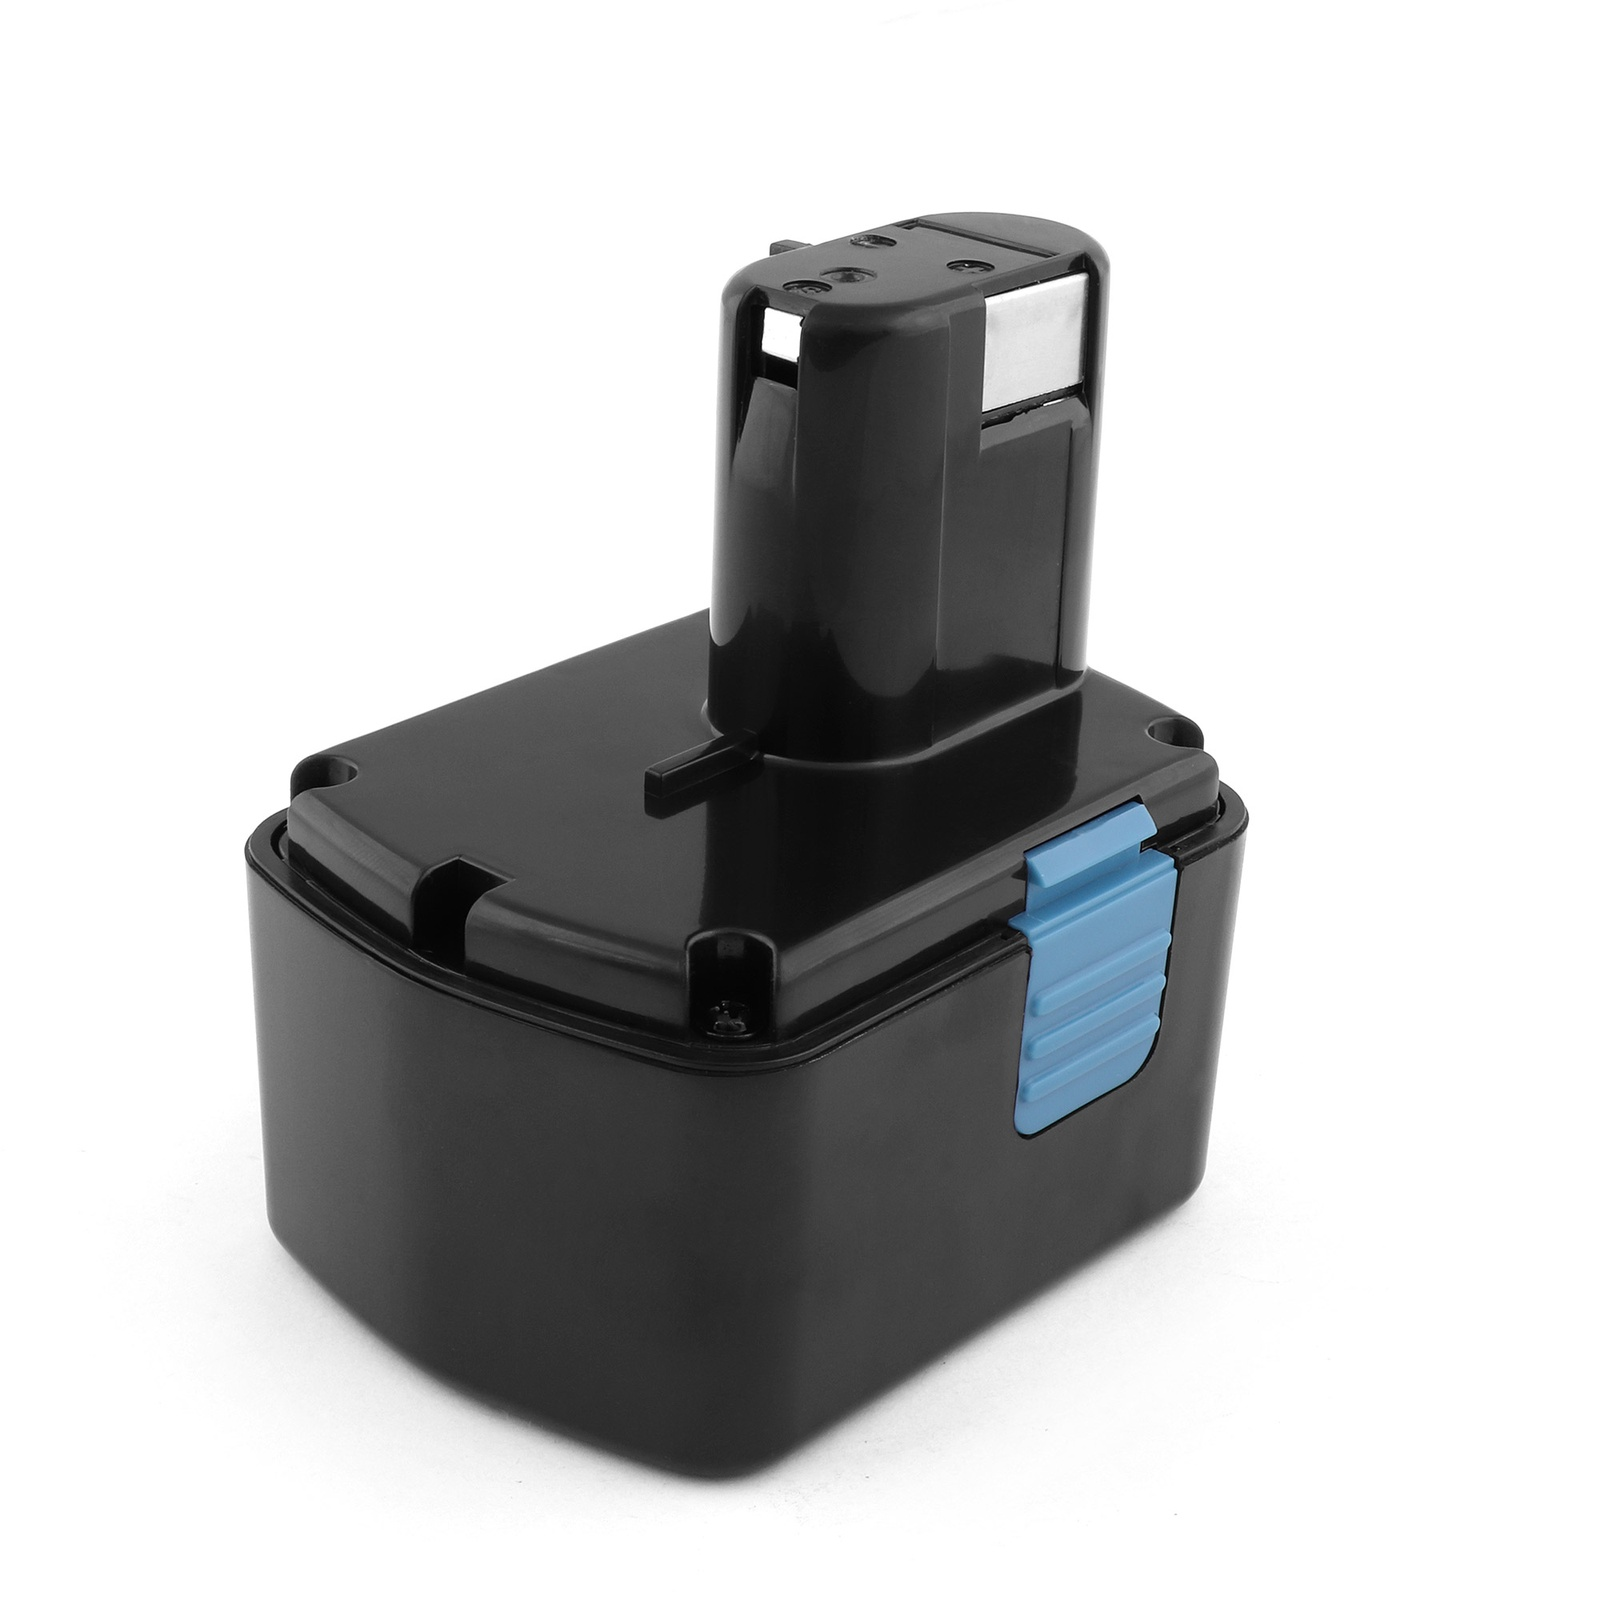 Аккумулятор для инструмента TopON TOP-PTGD-HIT-14.4-2.1 ниссей манжета cuff ds 1862 к тонометру модели ds 1862